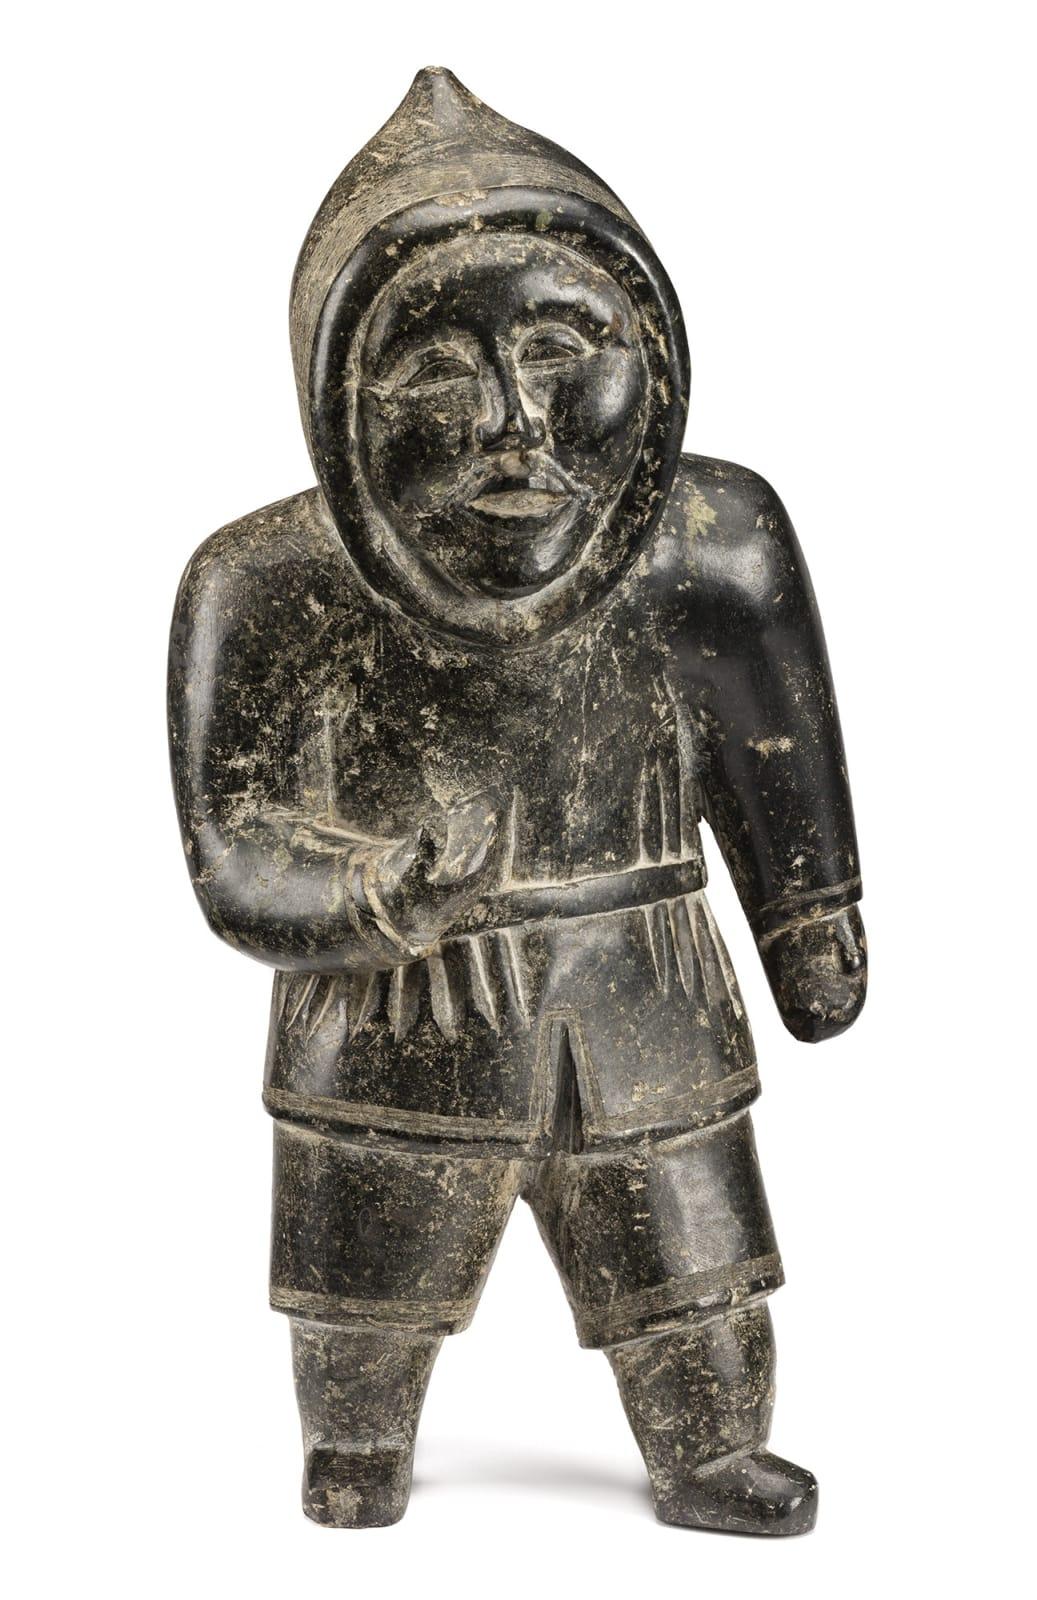 Lot 22 NIVIAQSI (NIVIAKSIAK) (1908-1959) m., KINNGAIT (CAPE DORSET) Standing Hunter, c. 1955 stone, 15 x 7.5 x 9.25 in (38.1 x 19.1 x 23.5 cm) Estimate: $12,000 — $18,000 PRICE REALIZED: $26,400